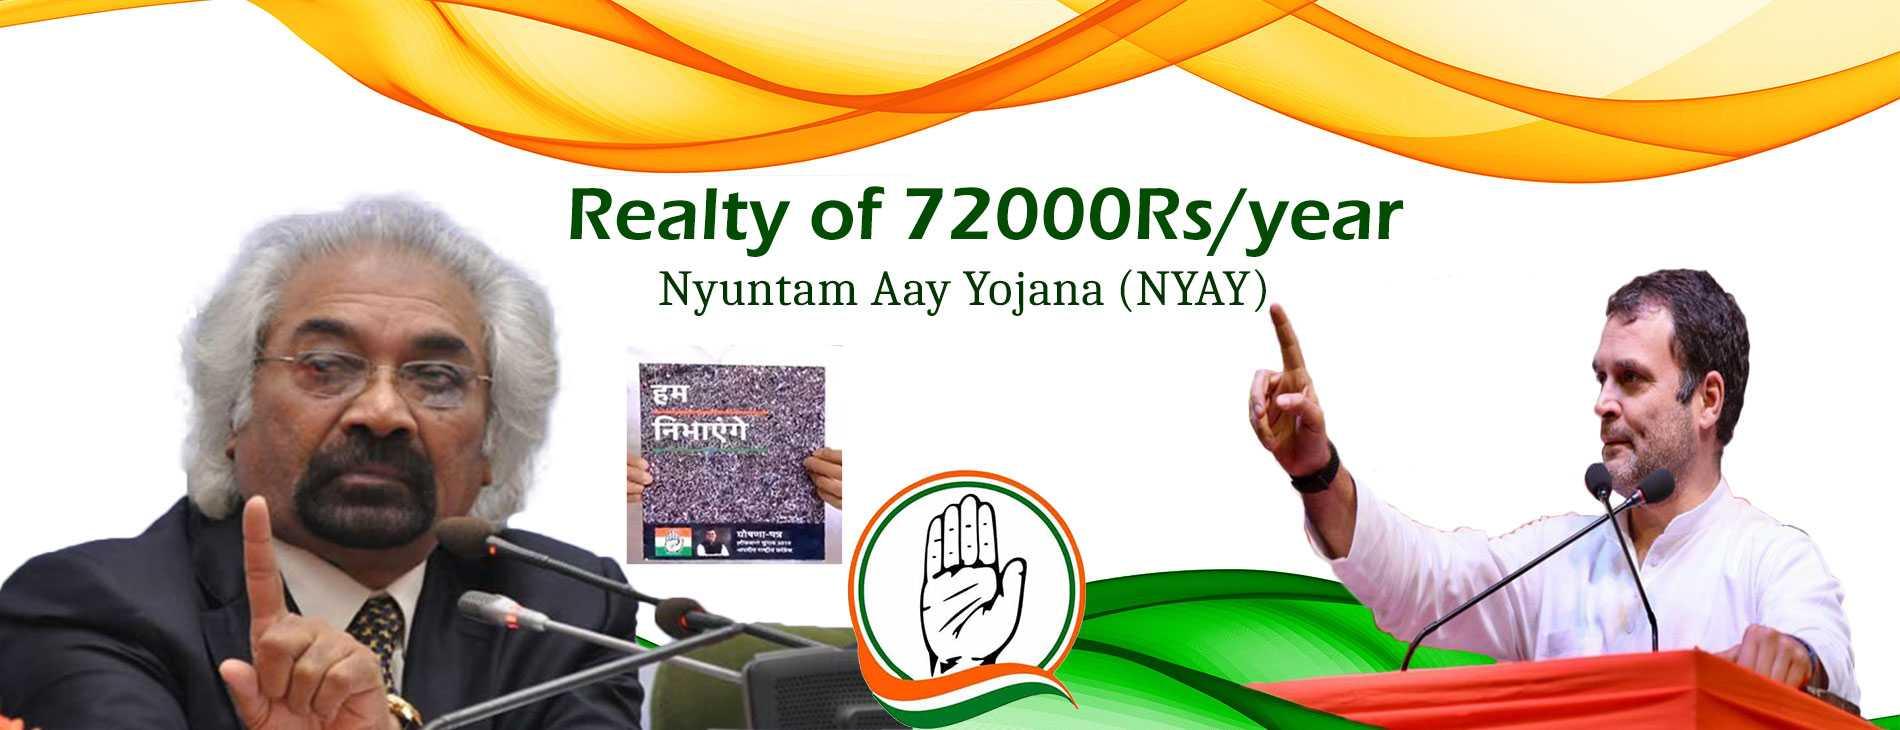 NYAY, congress manifesto